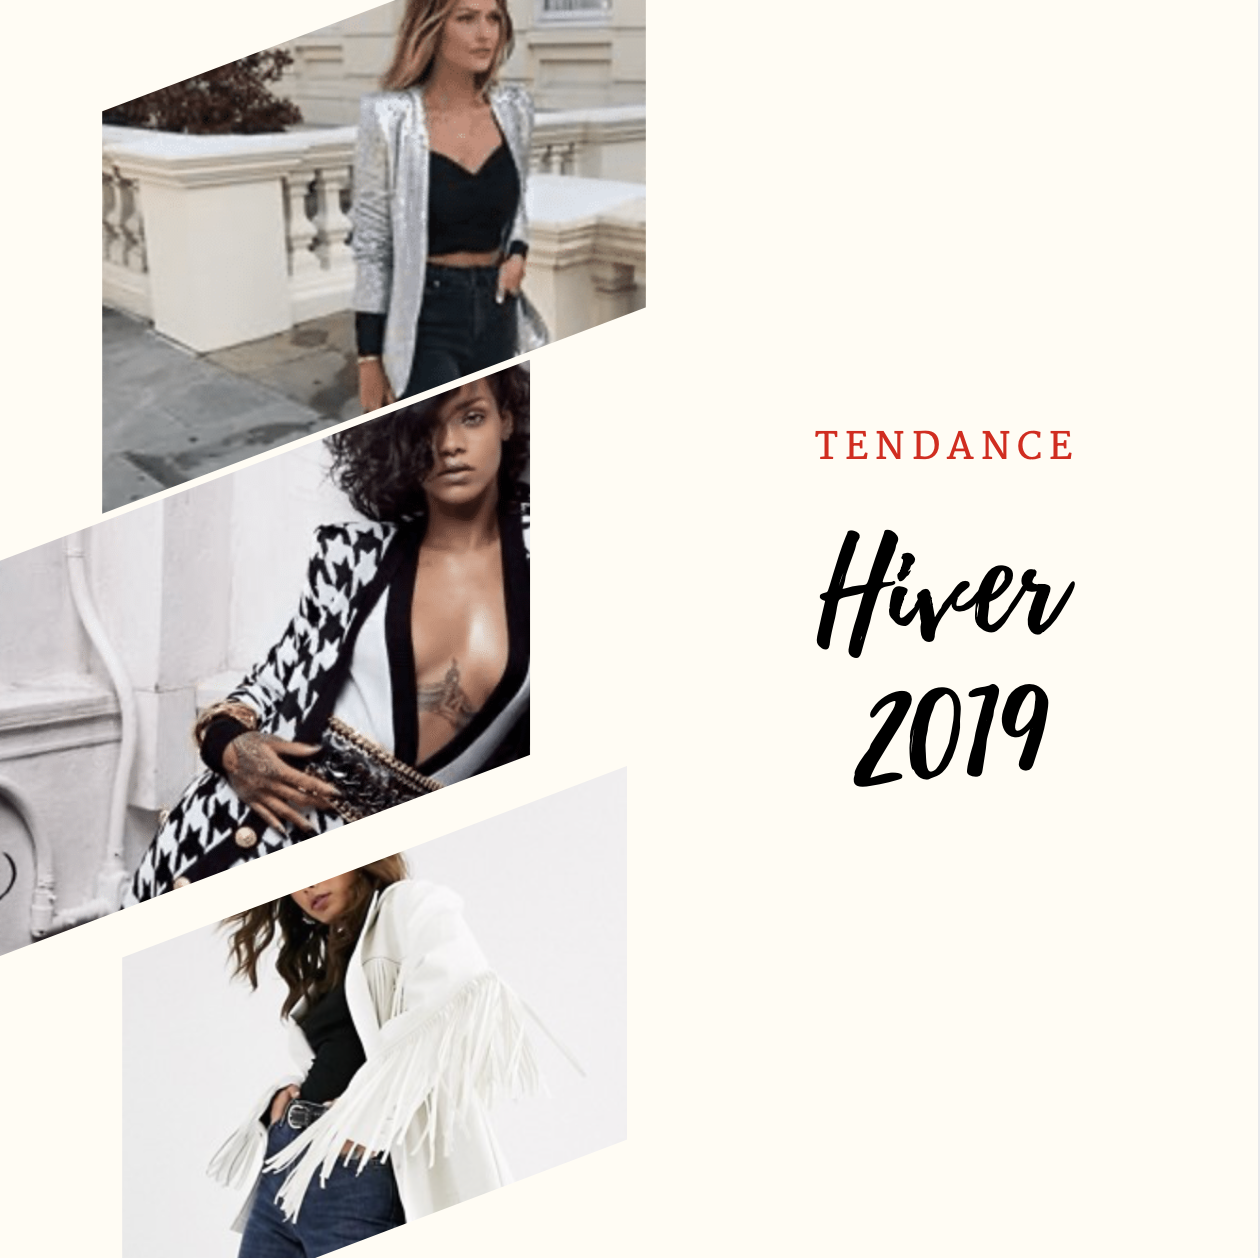 Tendance Hiver 2019 by Tiziri